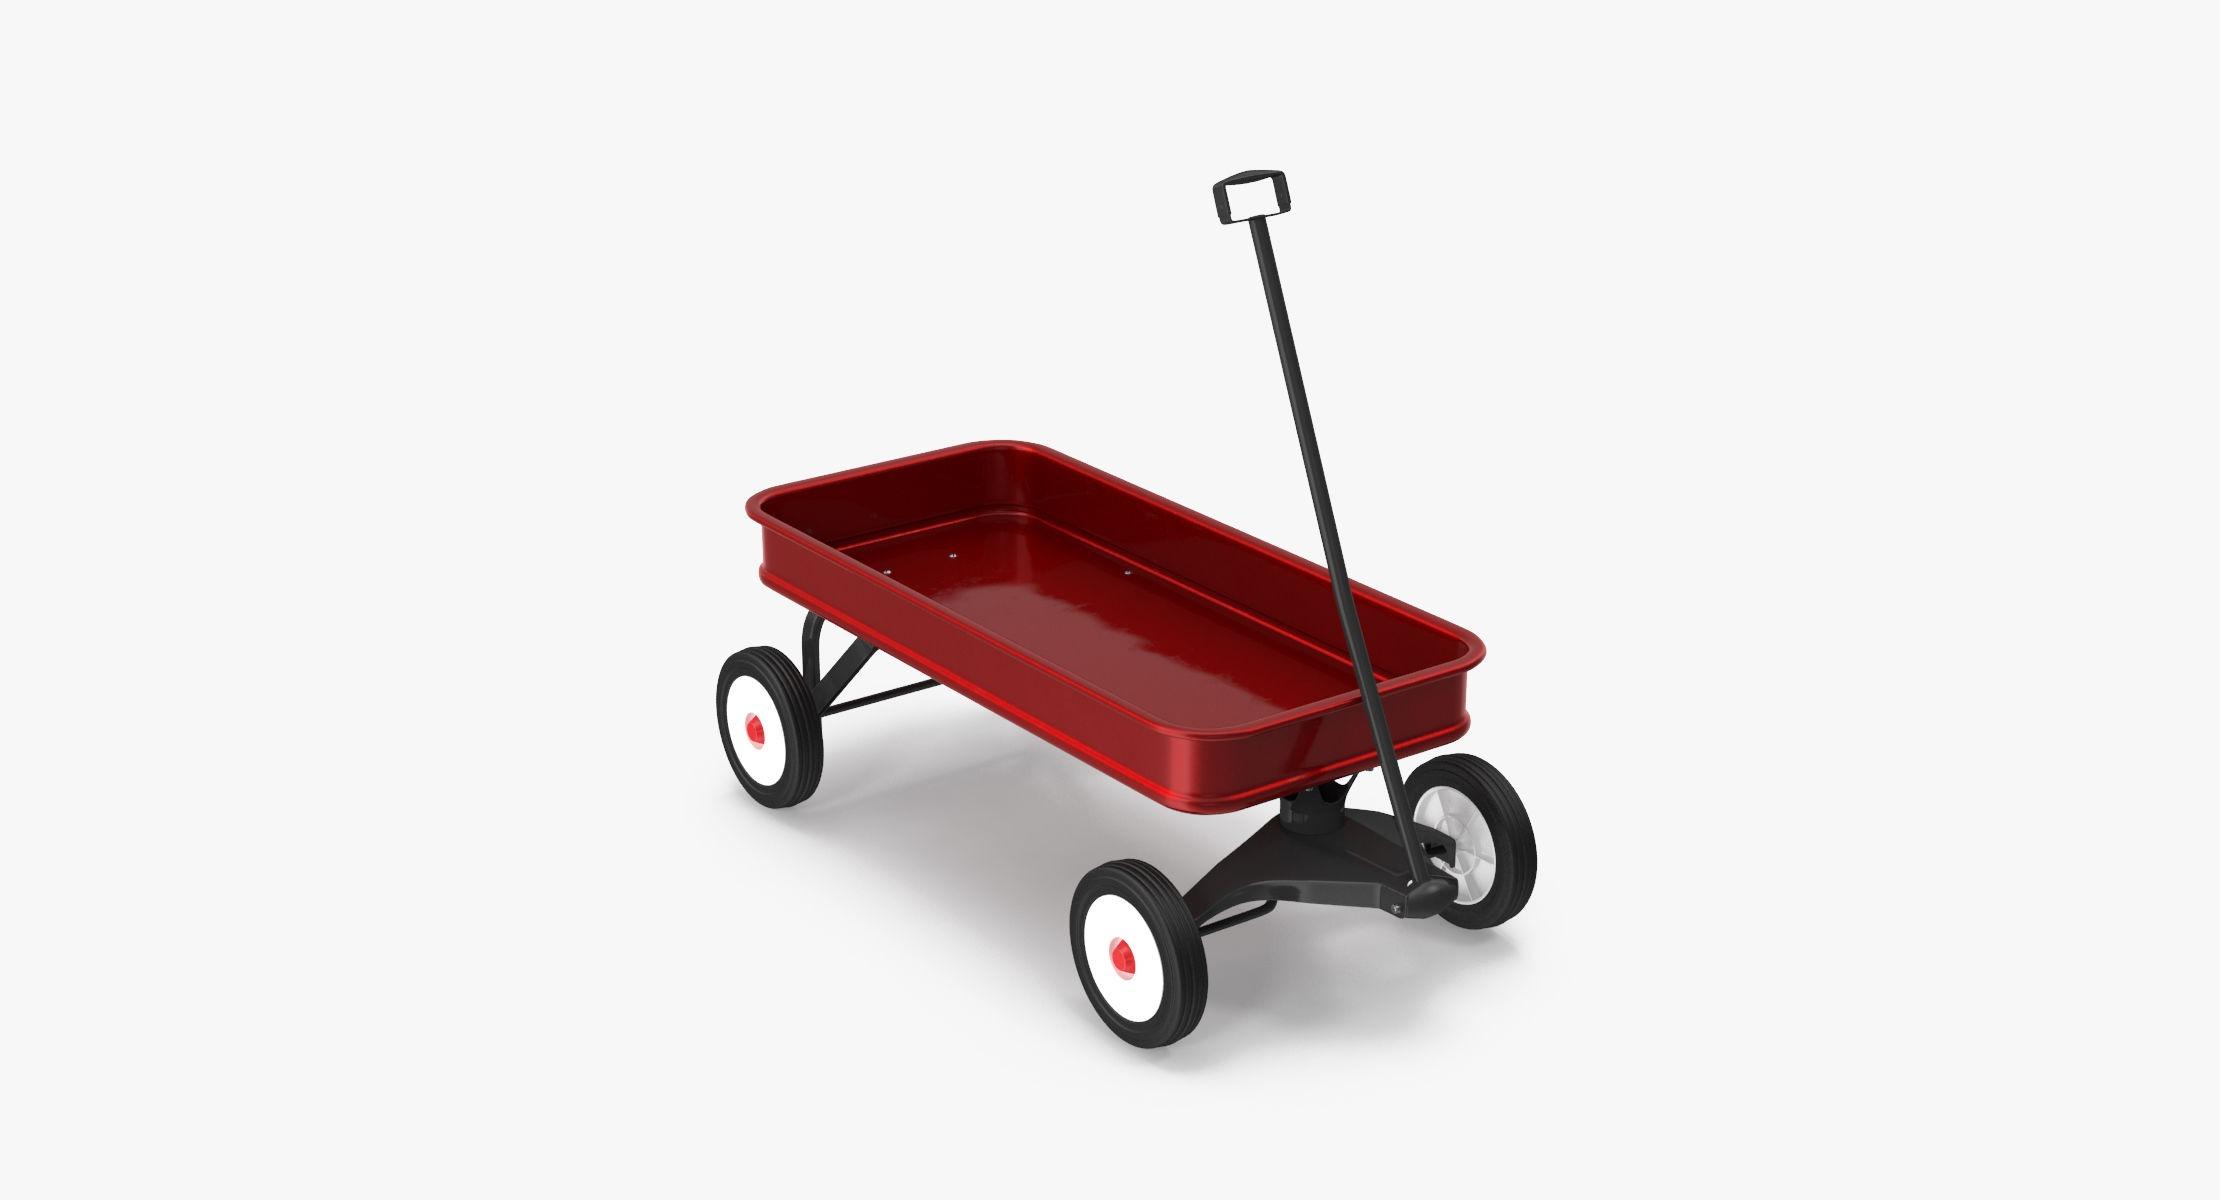 Child's Wagon 02 - reel 1